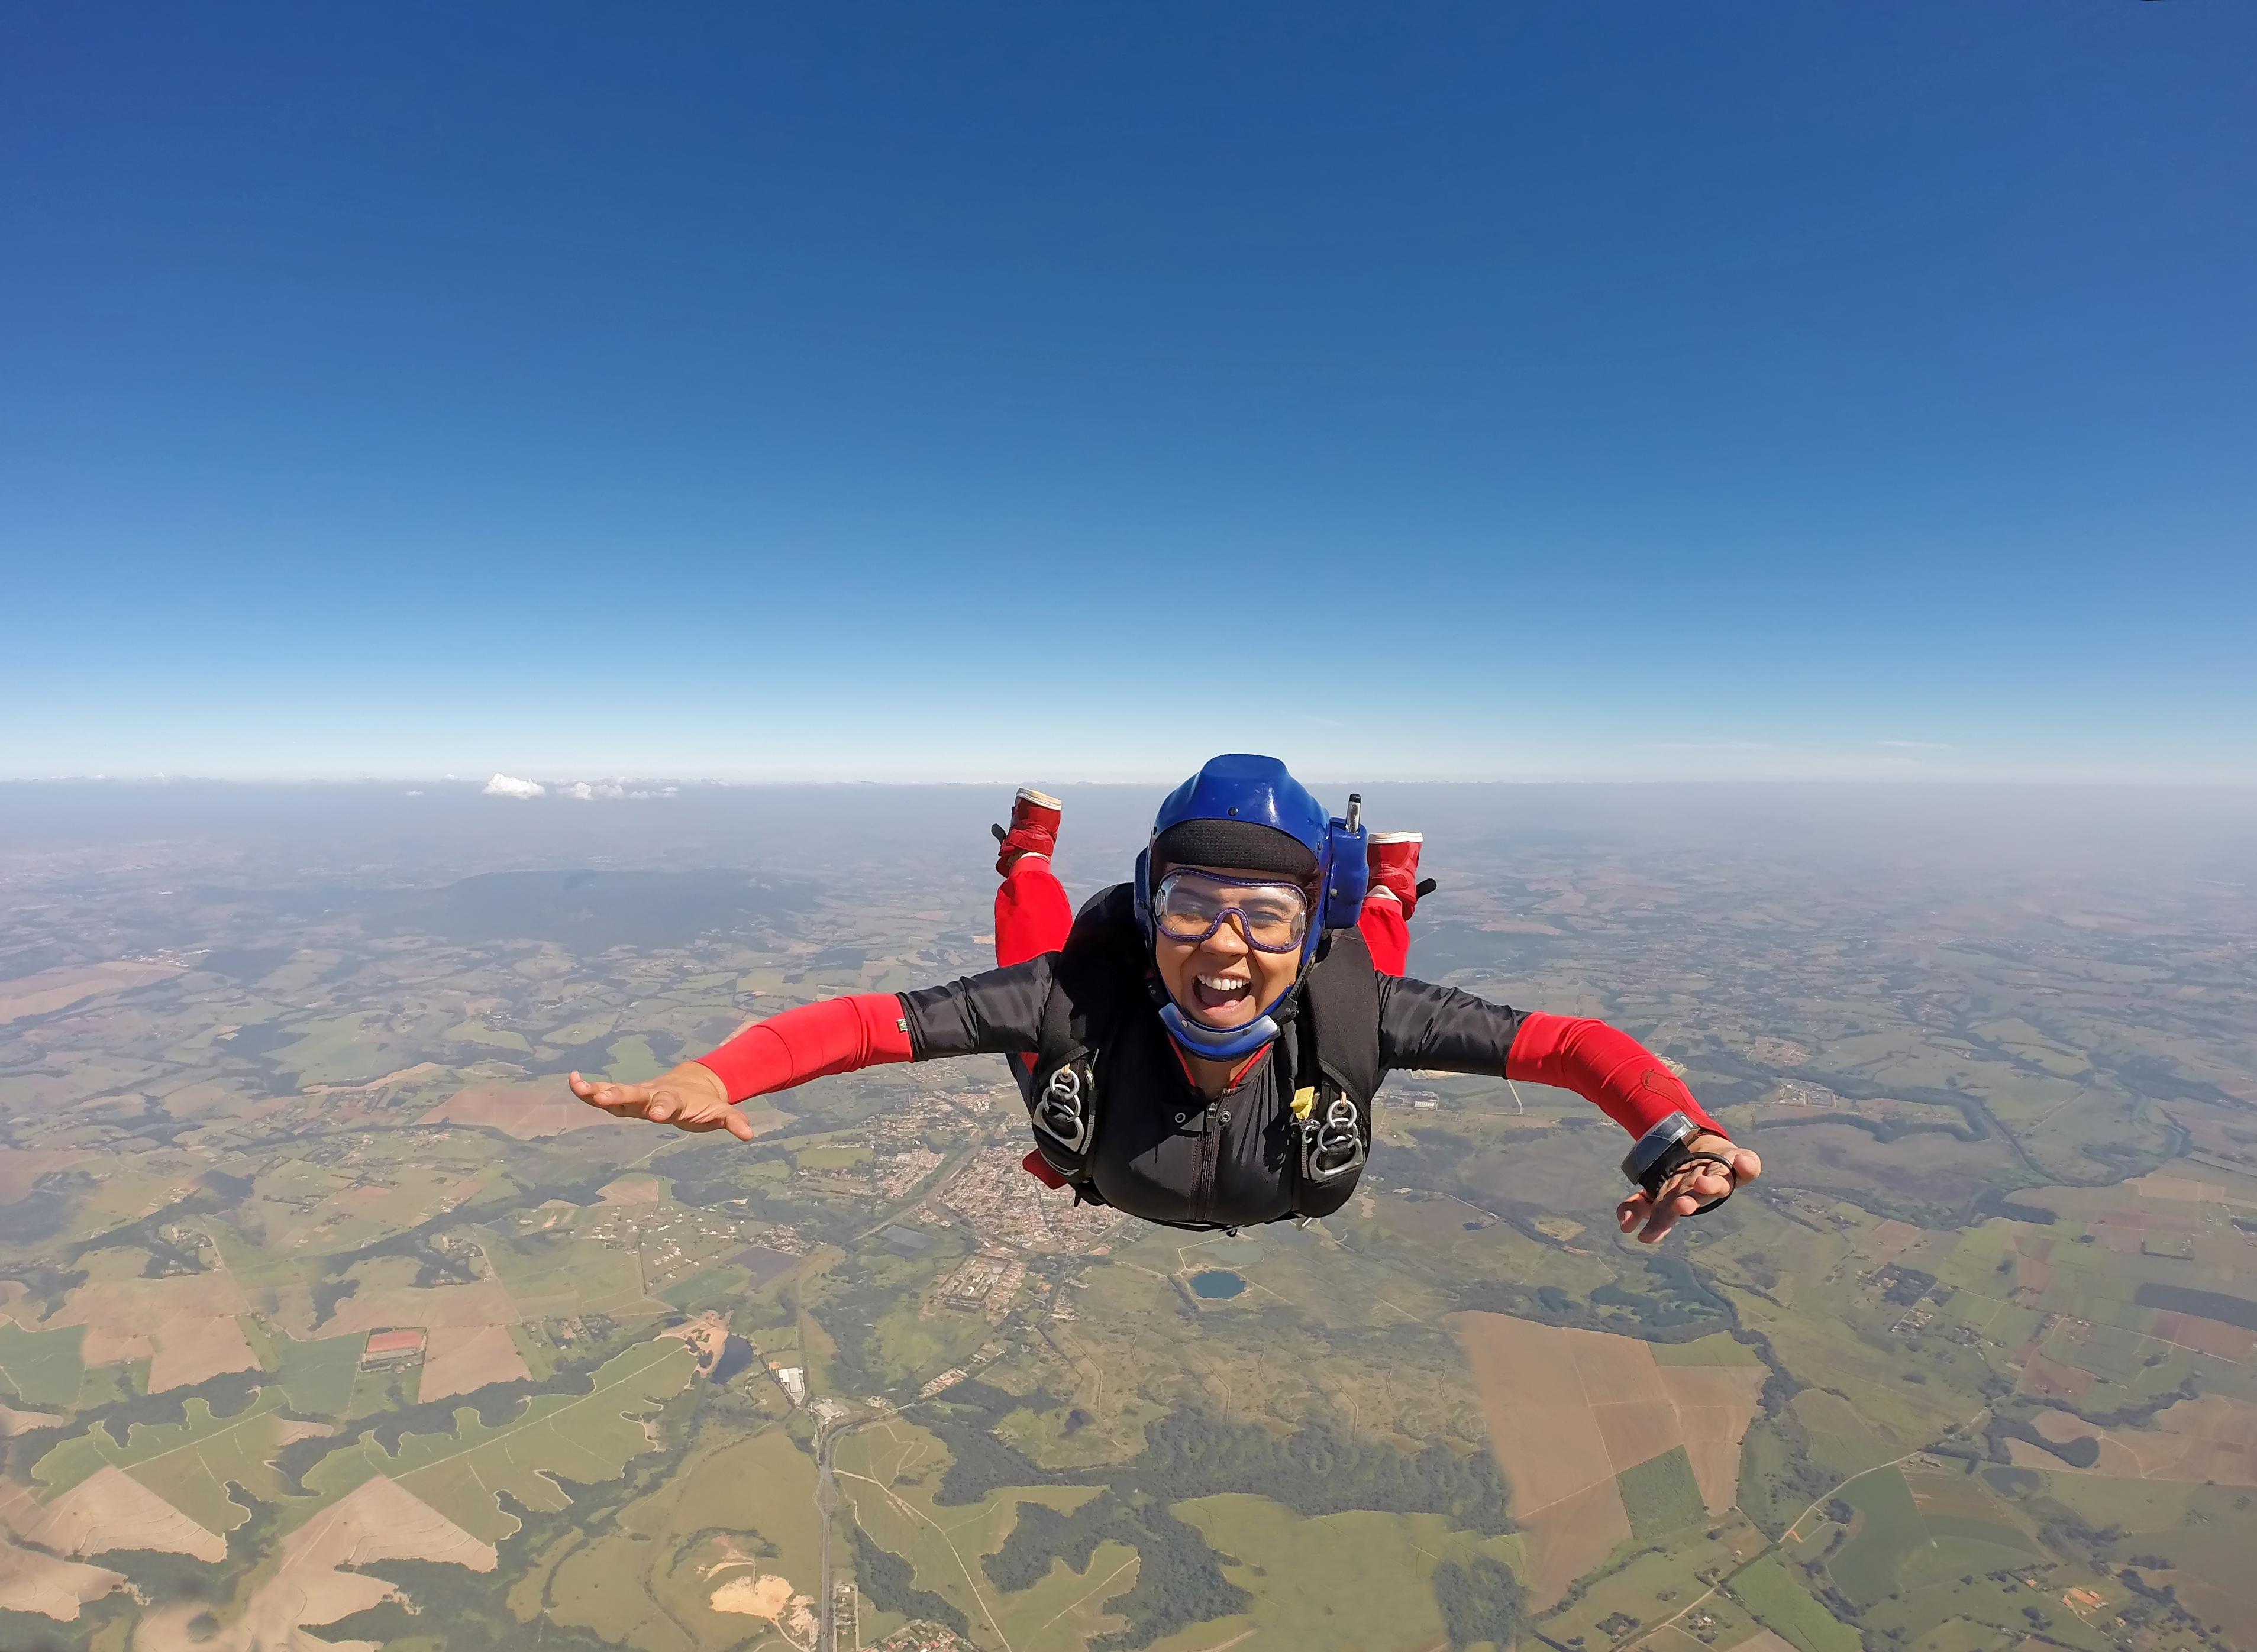 smiling woman skydiving